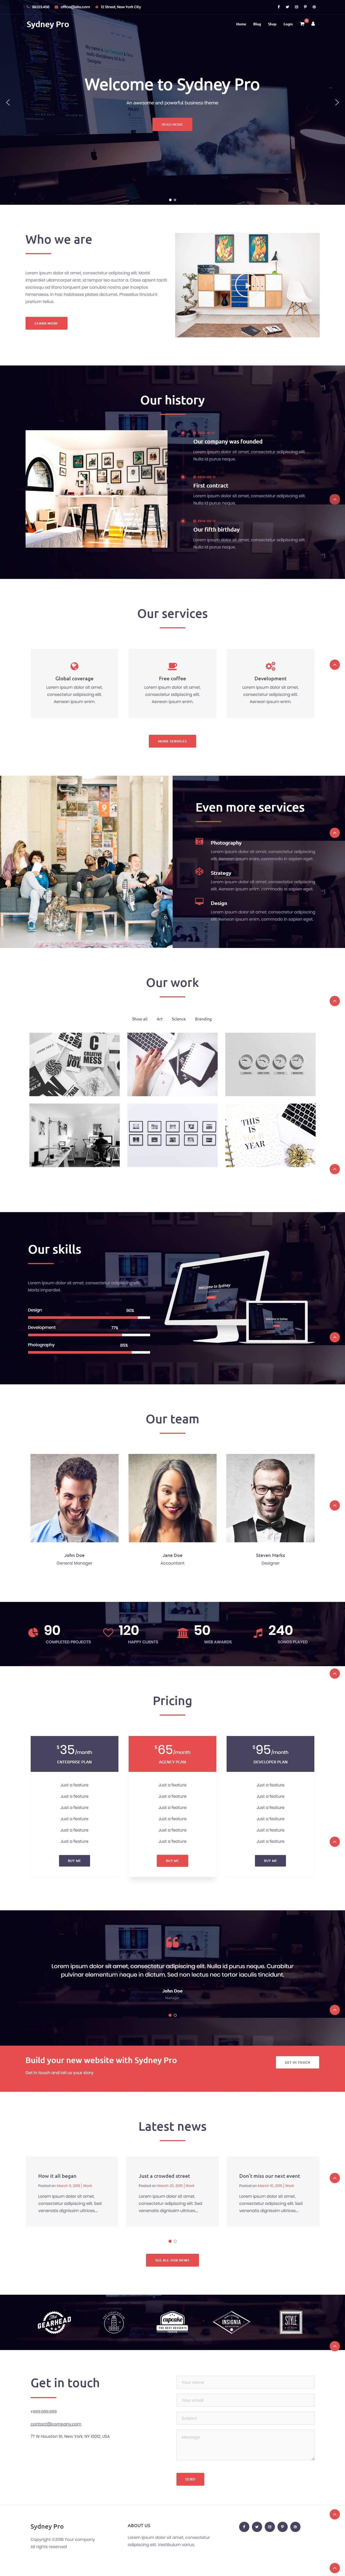 Sydney Pro - Premium Agency WordPress Themes and Templates